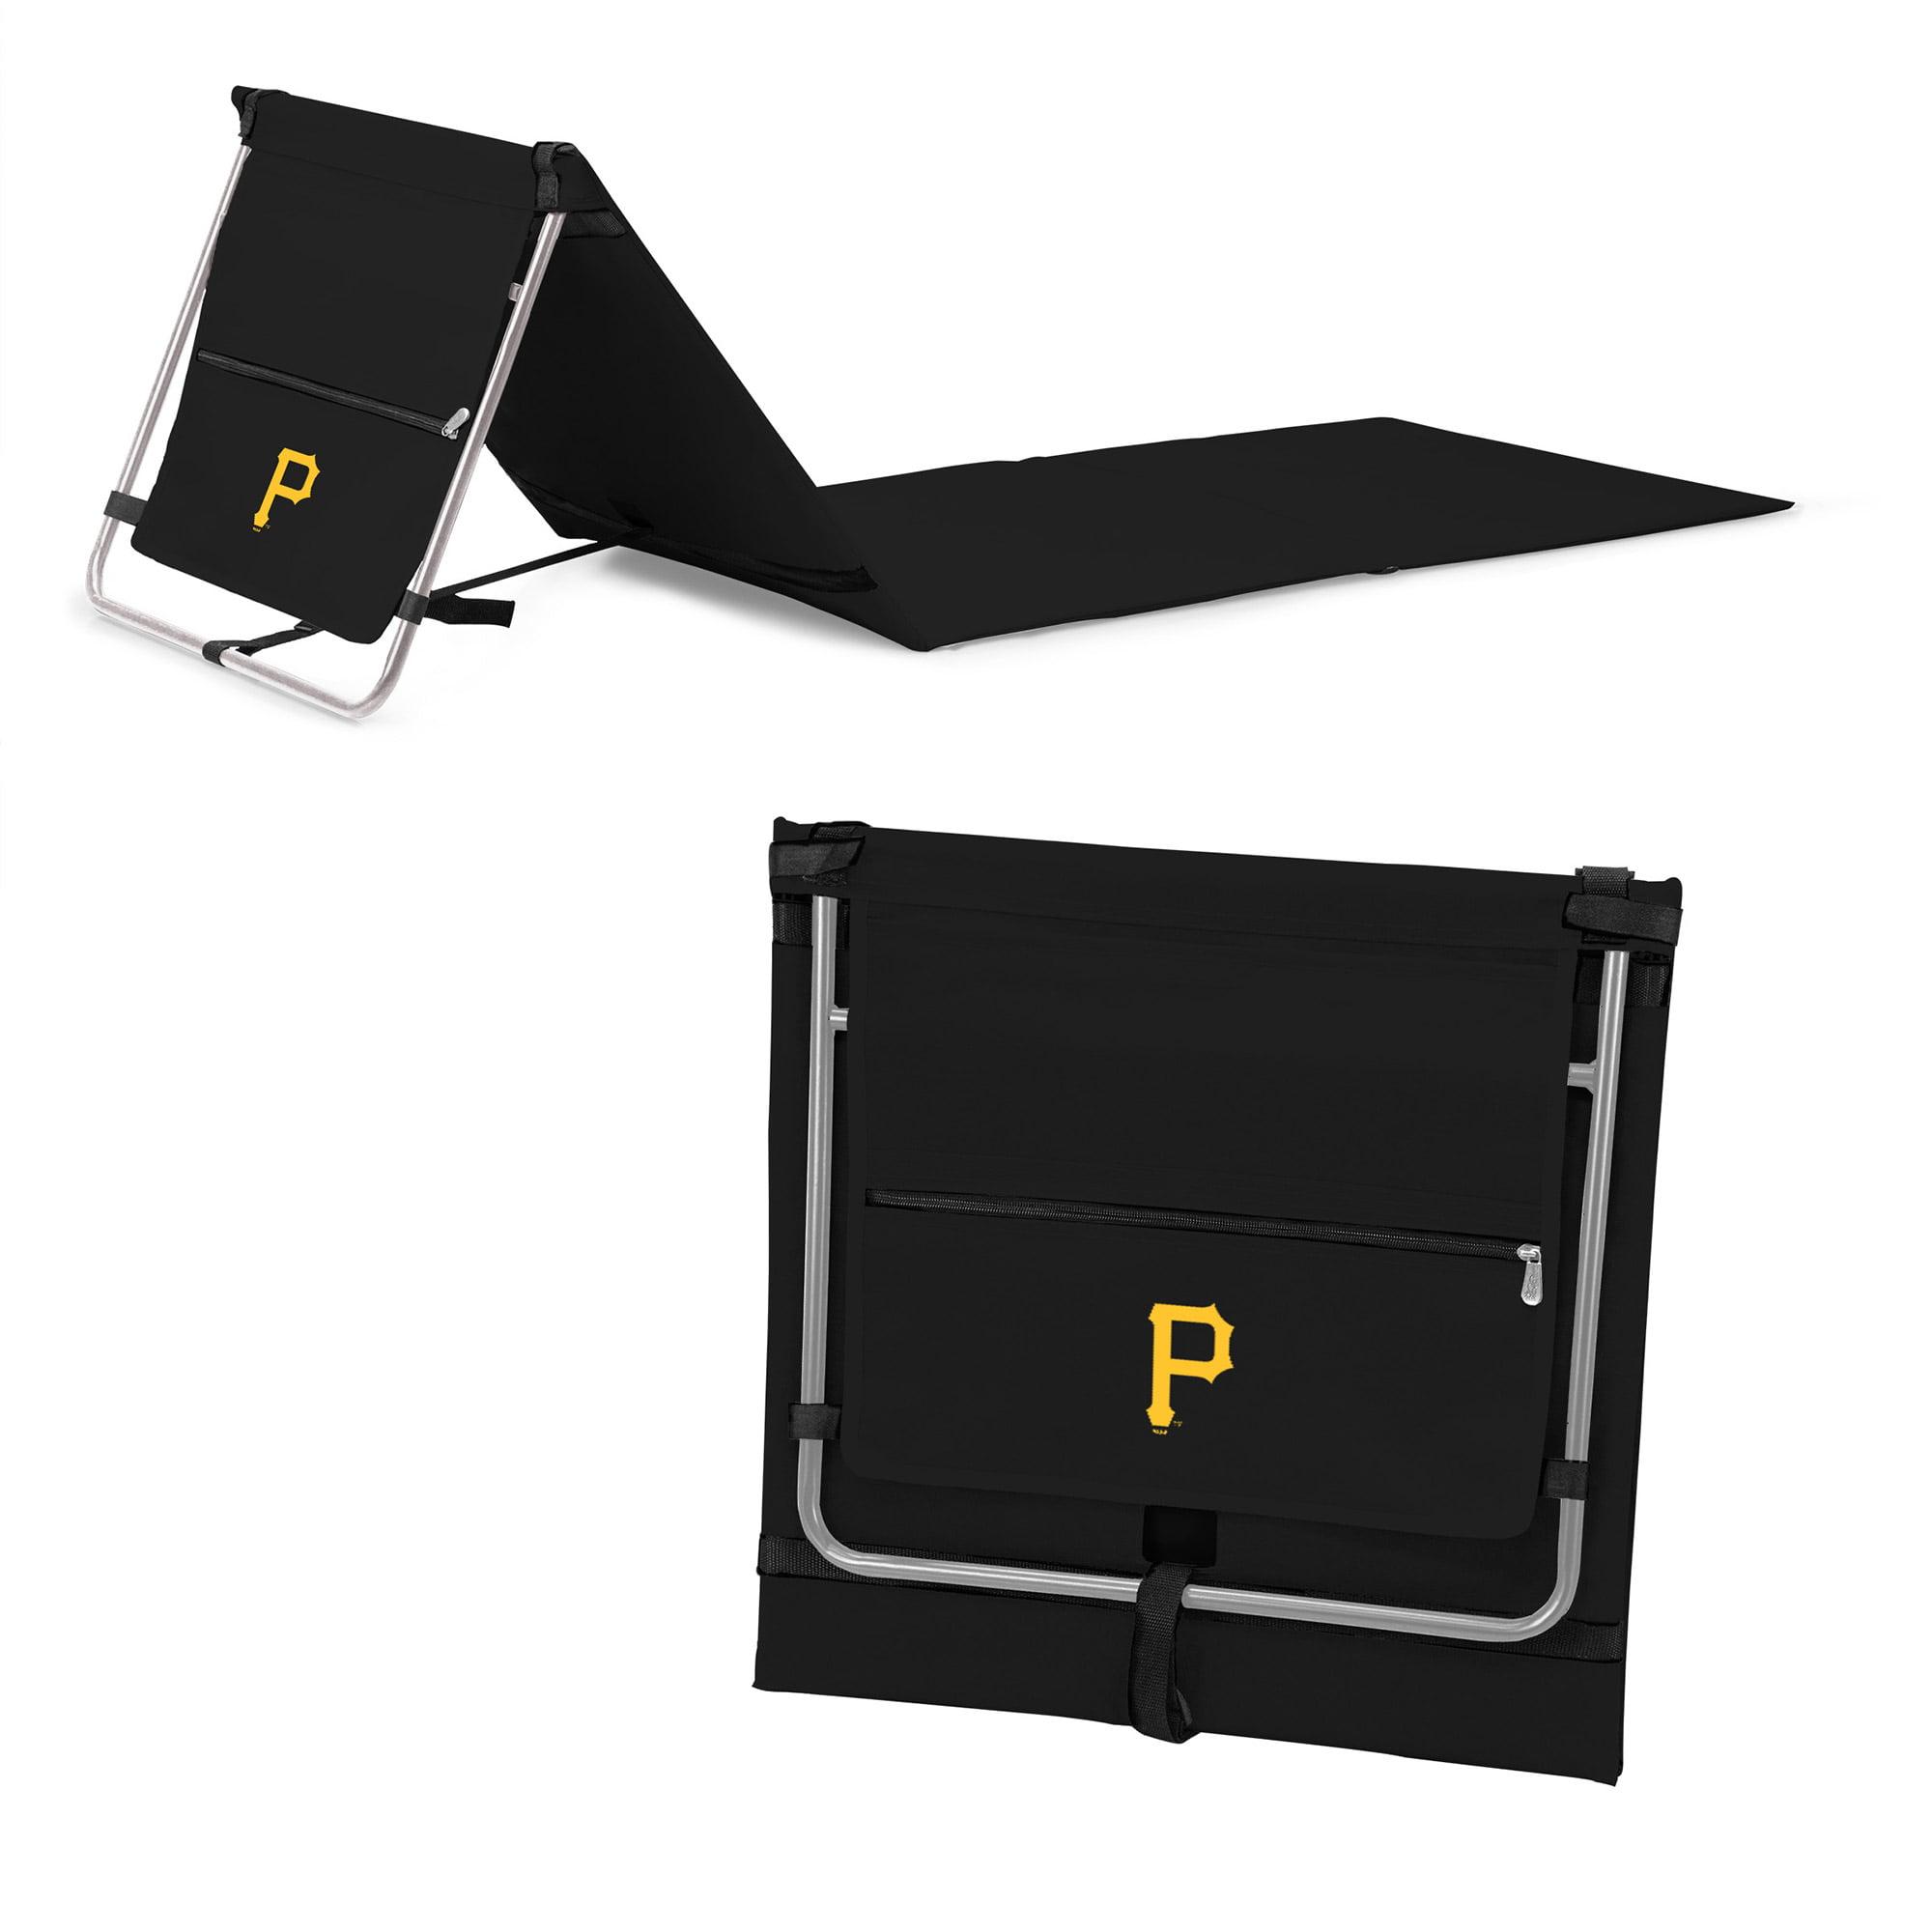 Pittsburgh Pirates Portable Lounger Beach Mat - Black - No Size